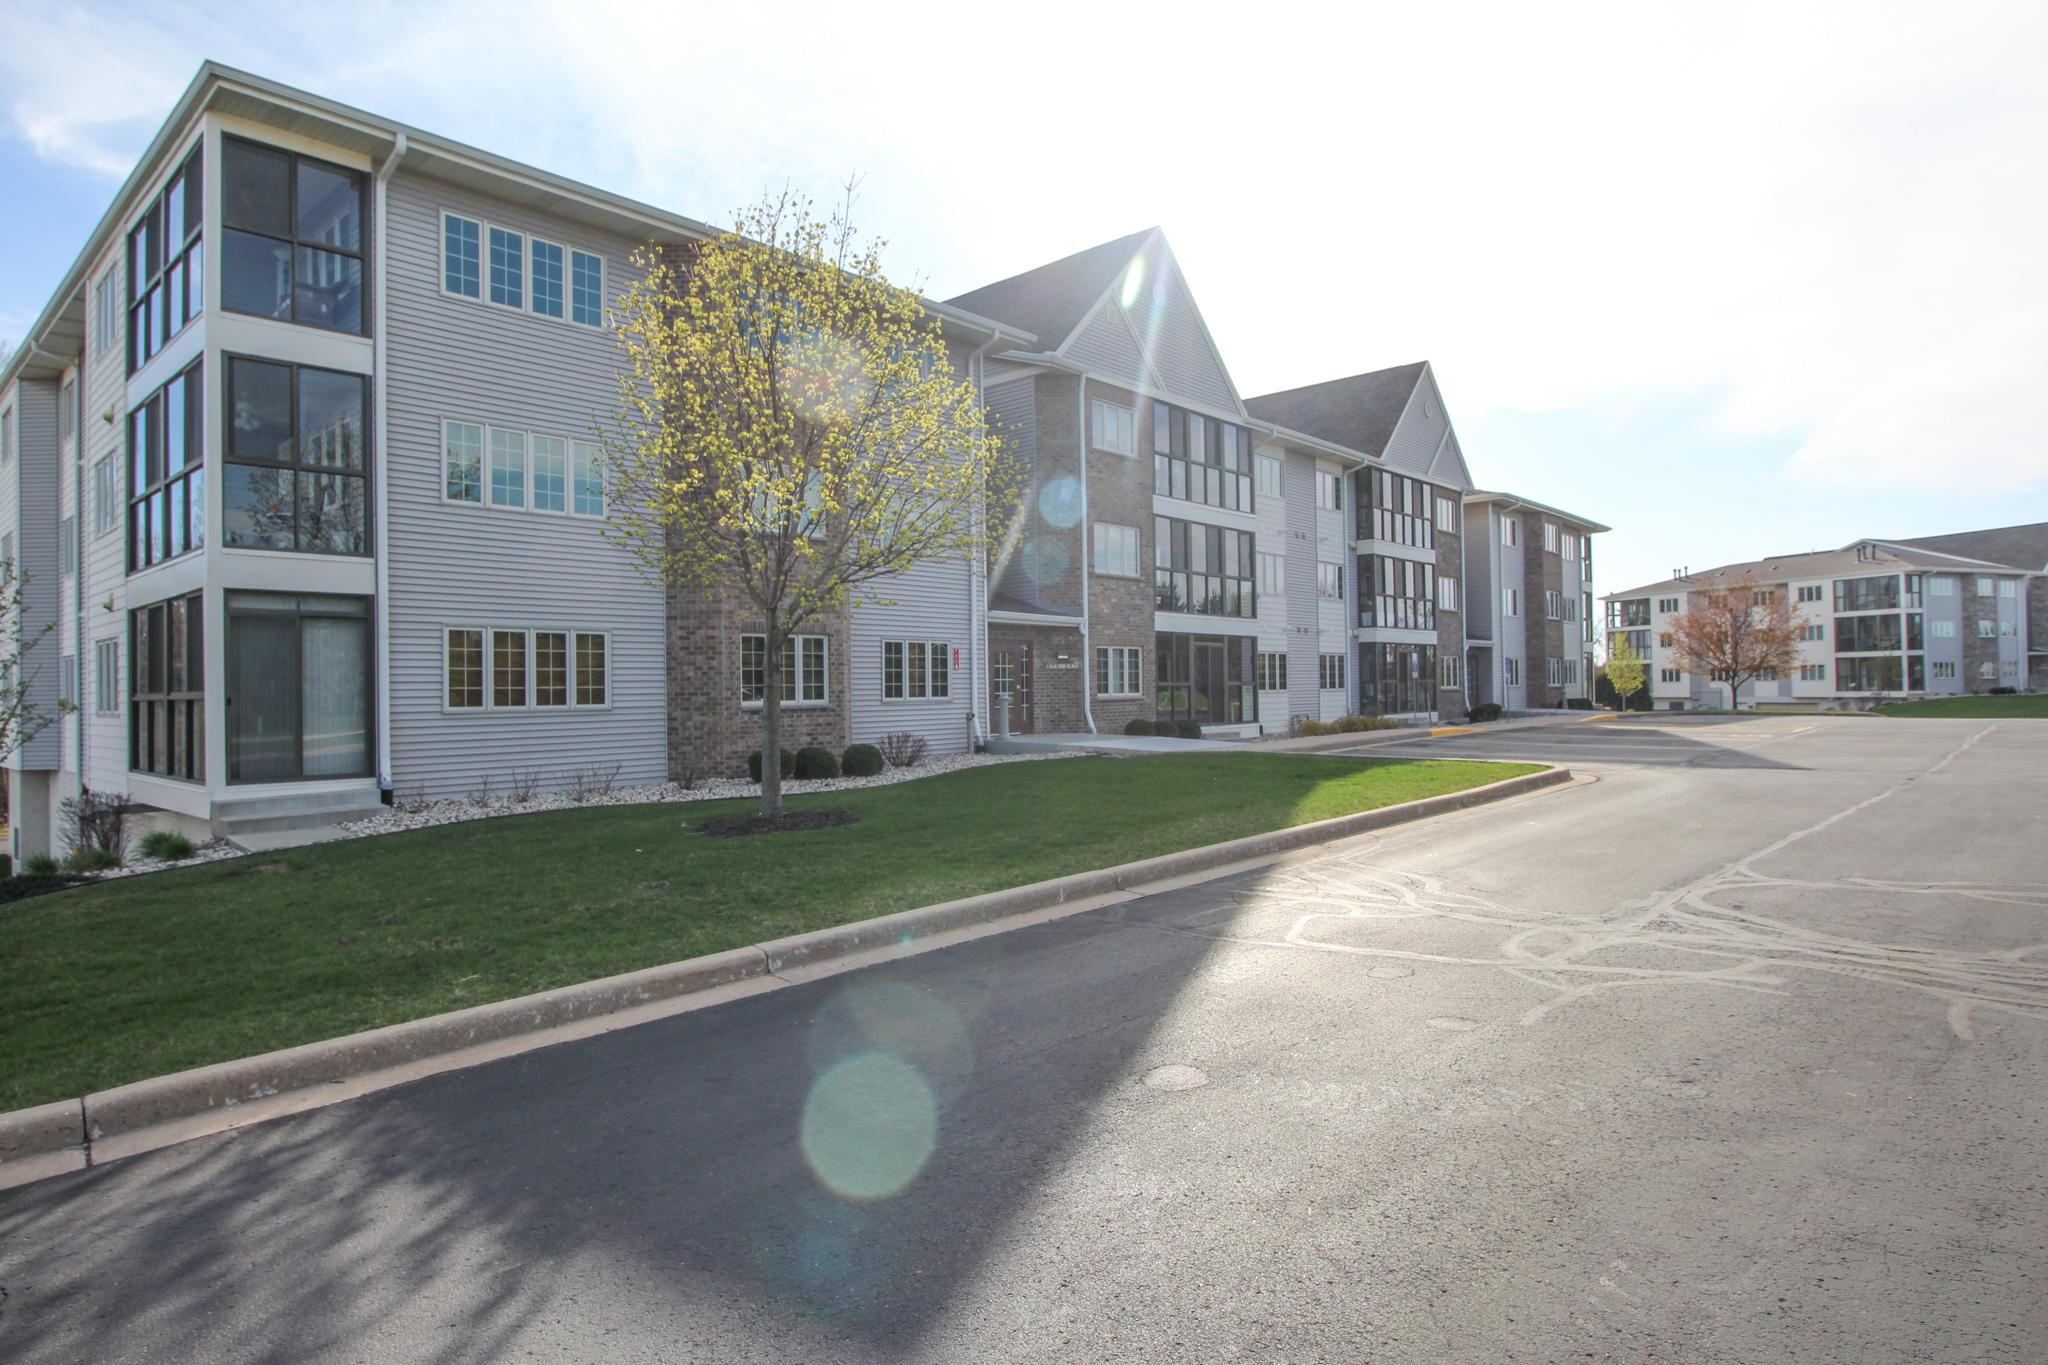 297 Oconomowoc Pkwy, Oconomowoc, Wisconsin 53066, 2 Bedrooms Bedrooms, 7 Rooms Rooms,2 BathroomsBathrooms,Condominiums,For Sale,Oconomowoc Pkwy,3,1735831